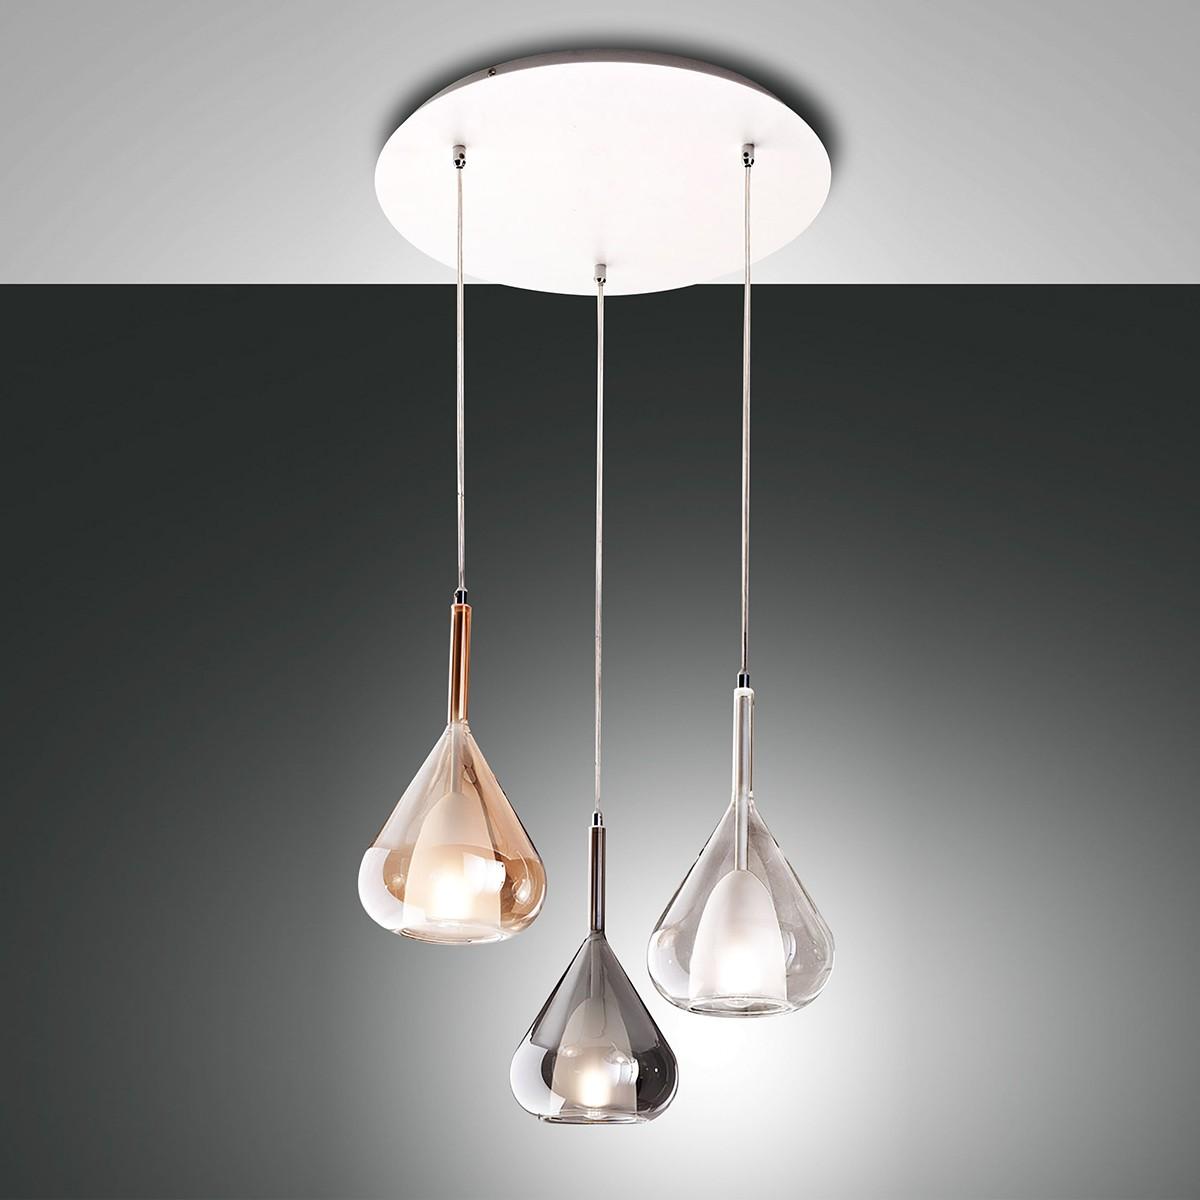 Fabas Luce Lila Pendelleuchte, 3-flg., amber / grau transparent / transparent